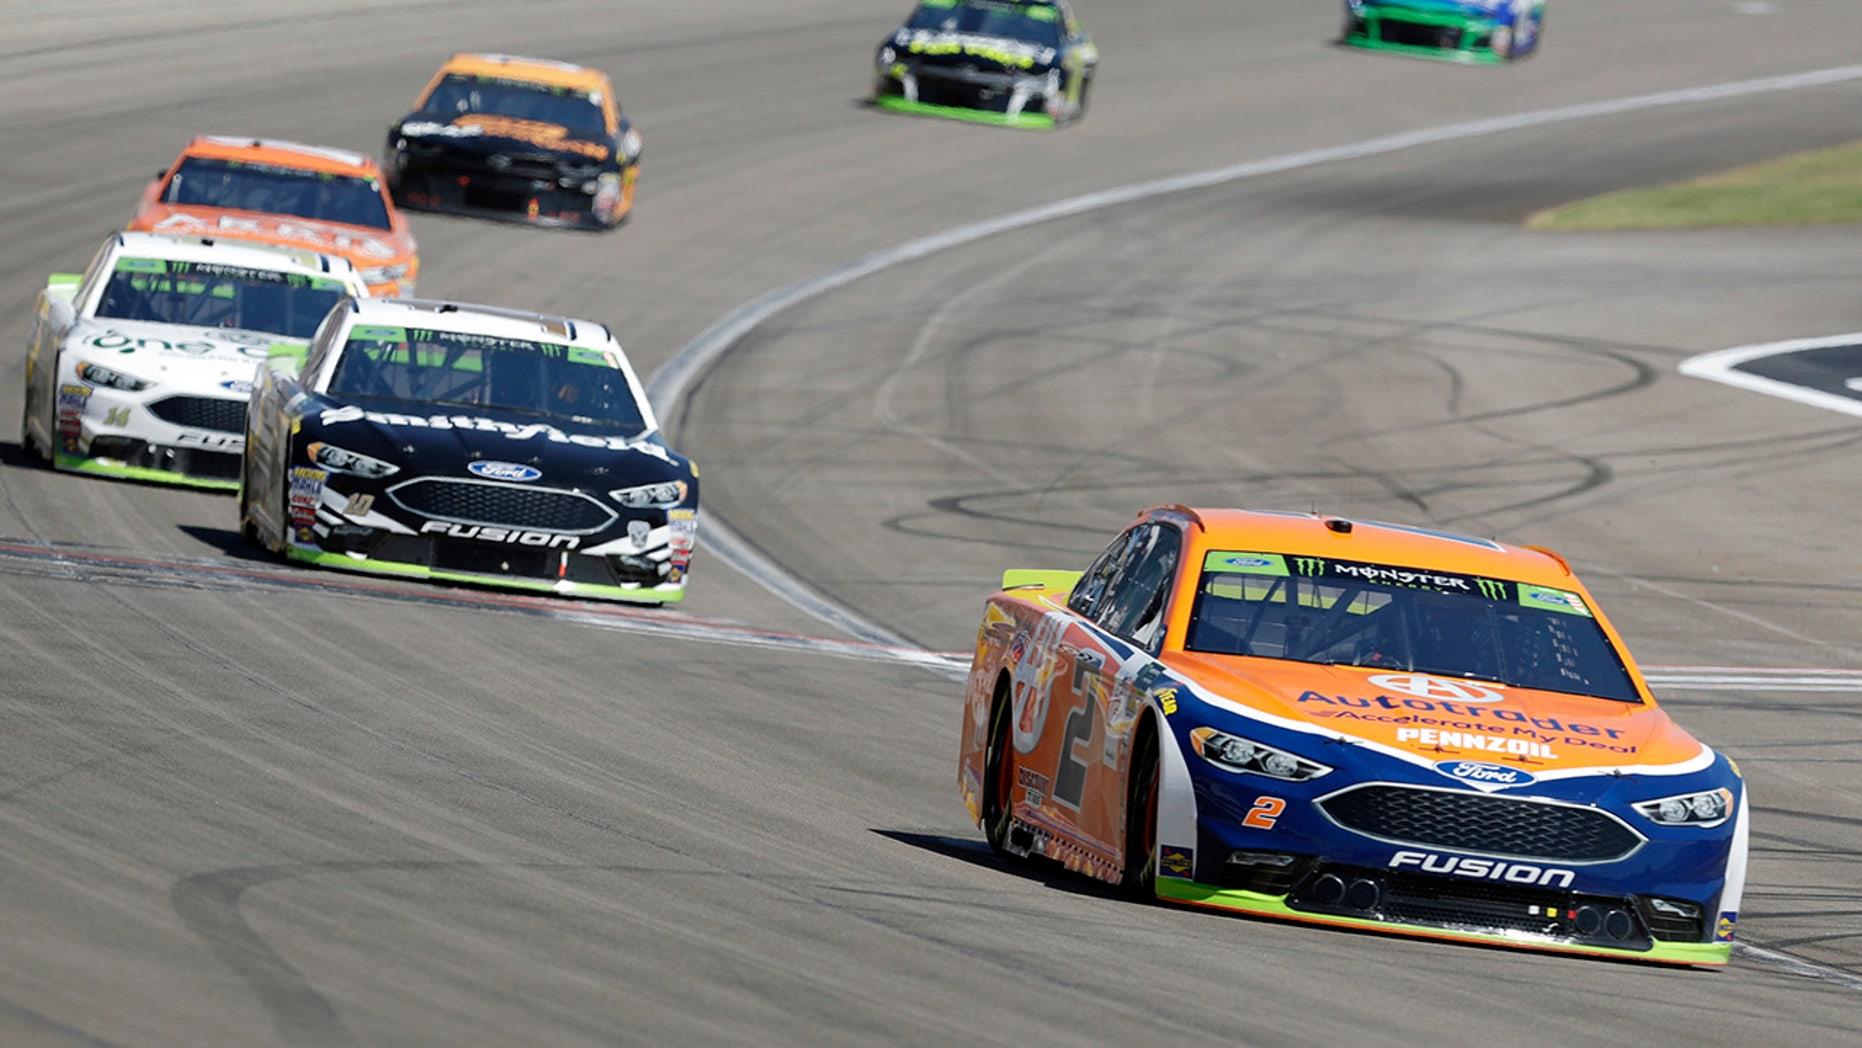 Brad Keselowski (2) drives during a NASCAR Cup Series auto race Sunday, Sept. 16, 2018, in Las Vegas. (AP Photo/Isaac Brekken)